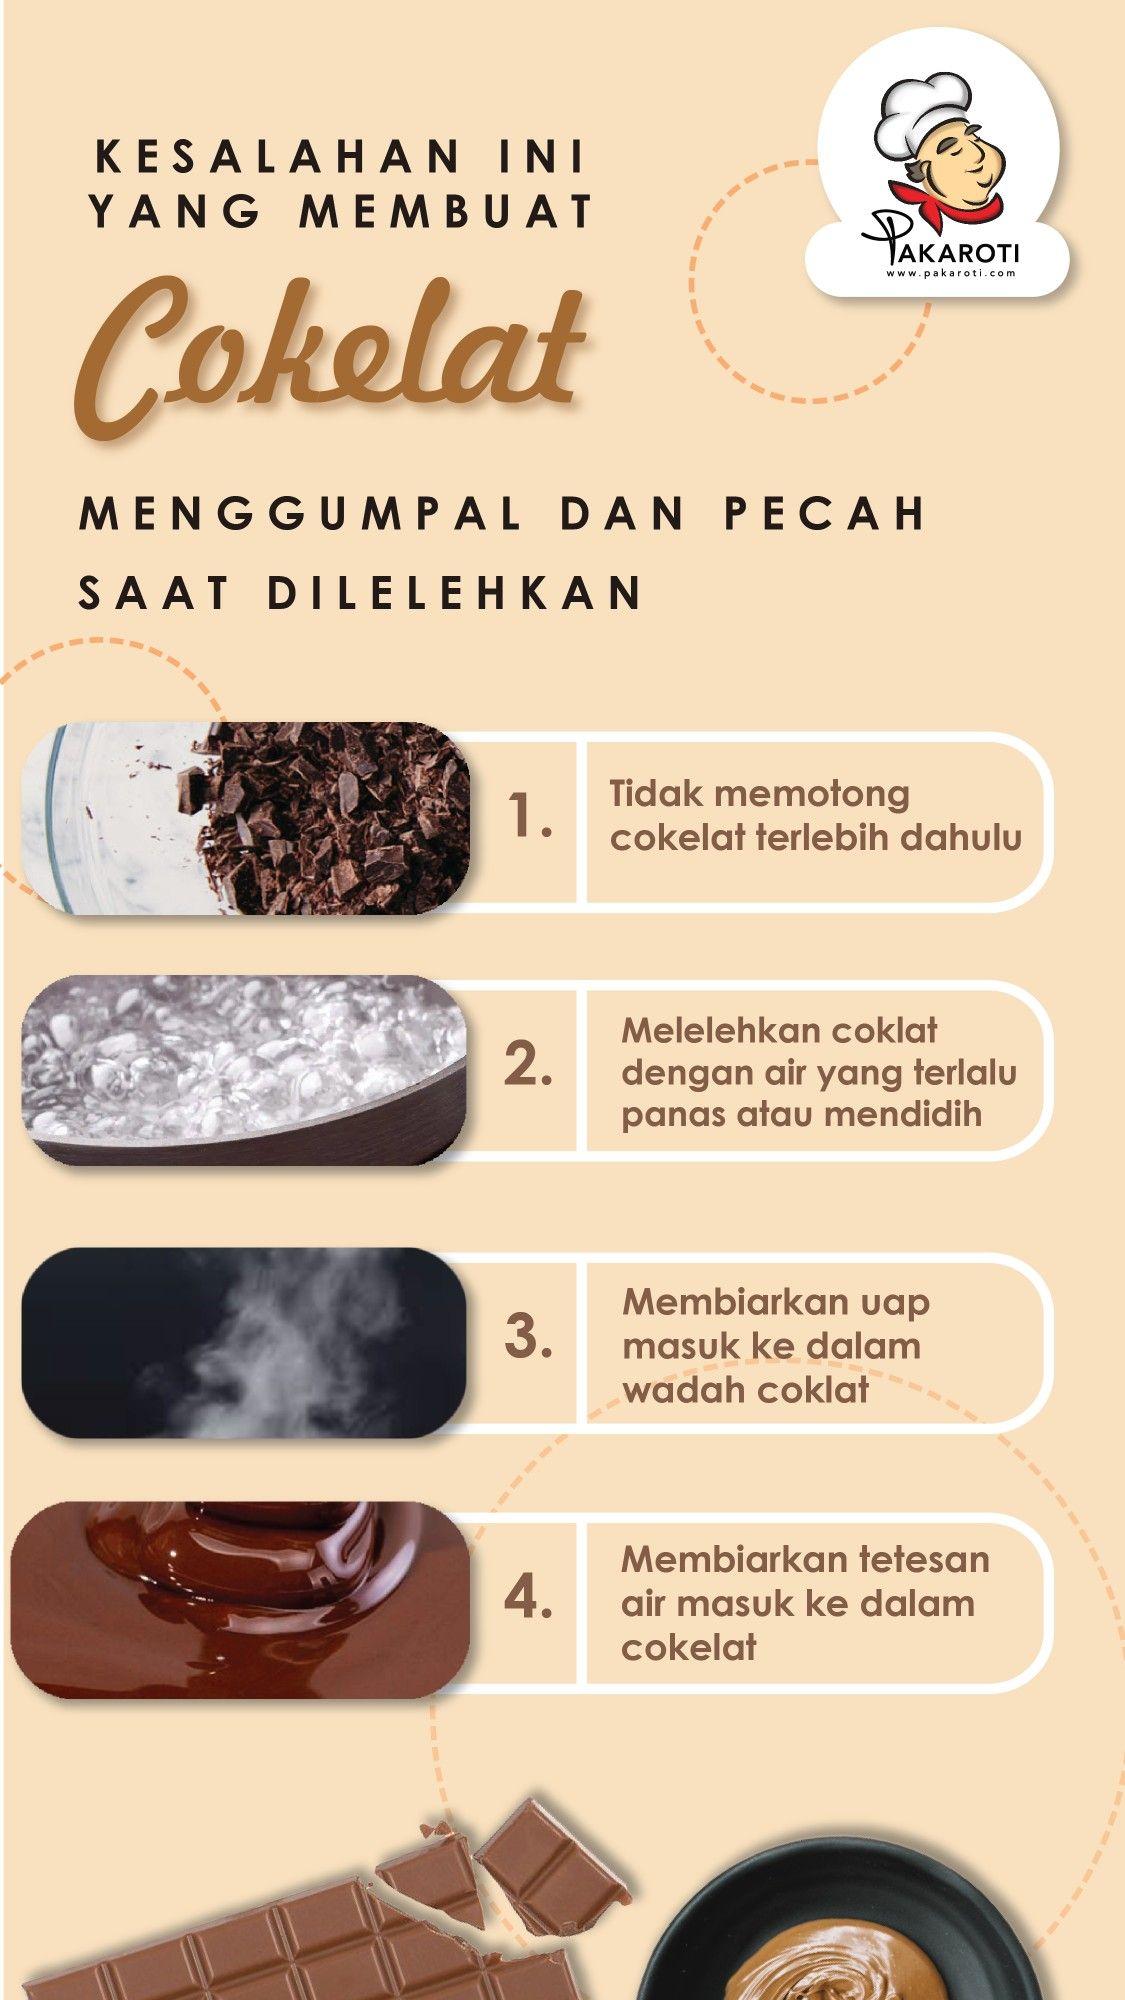 Kesalahan Ini Yang Membuat Coklat Menggumpal Dan Pecah Saat Dilelehkan Makanan Makanan Dan Minuman Makanan Ringan Manis